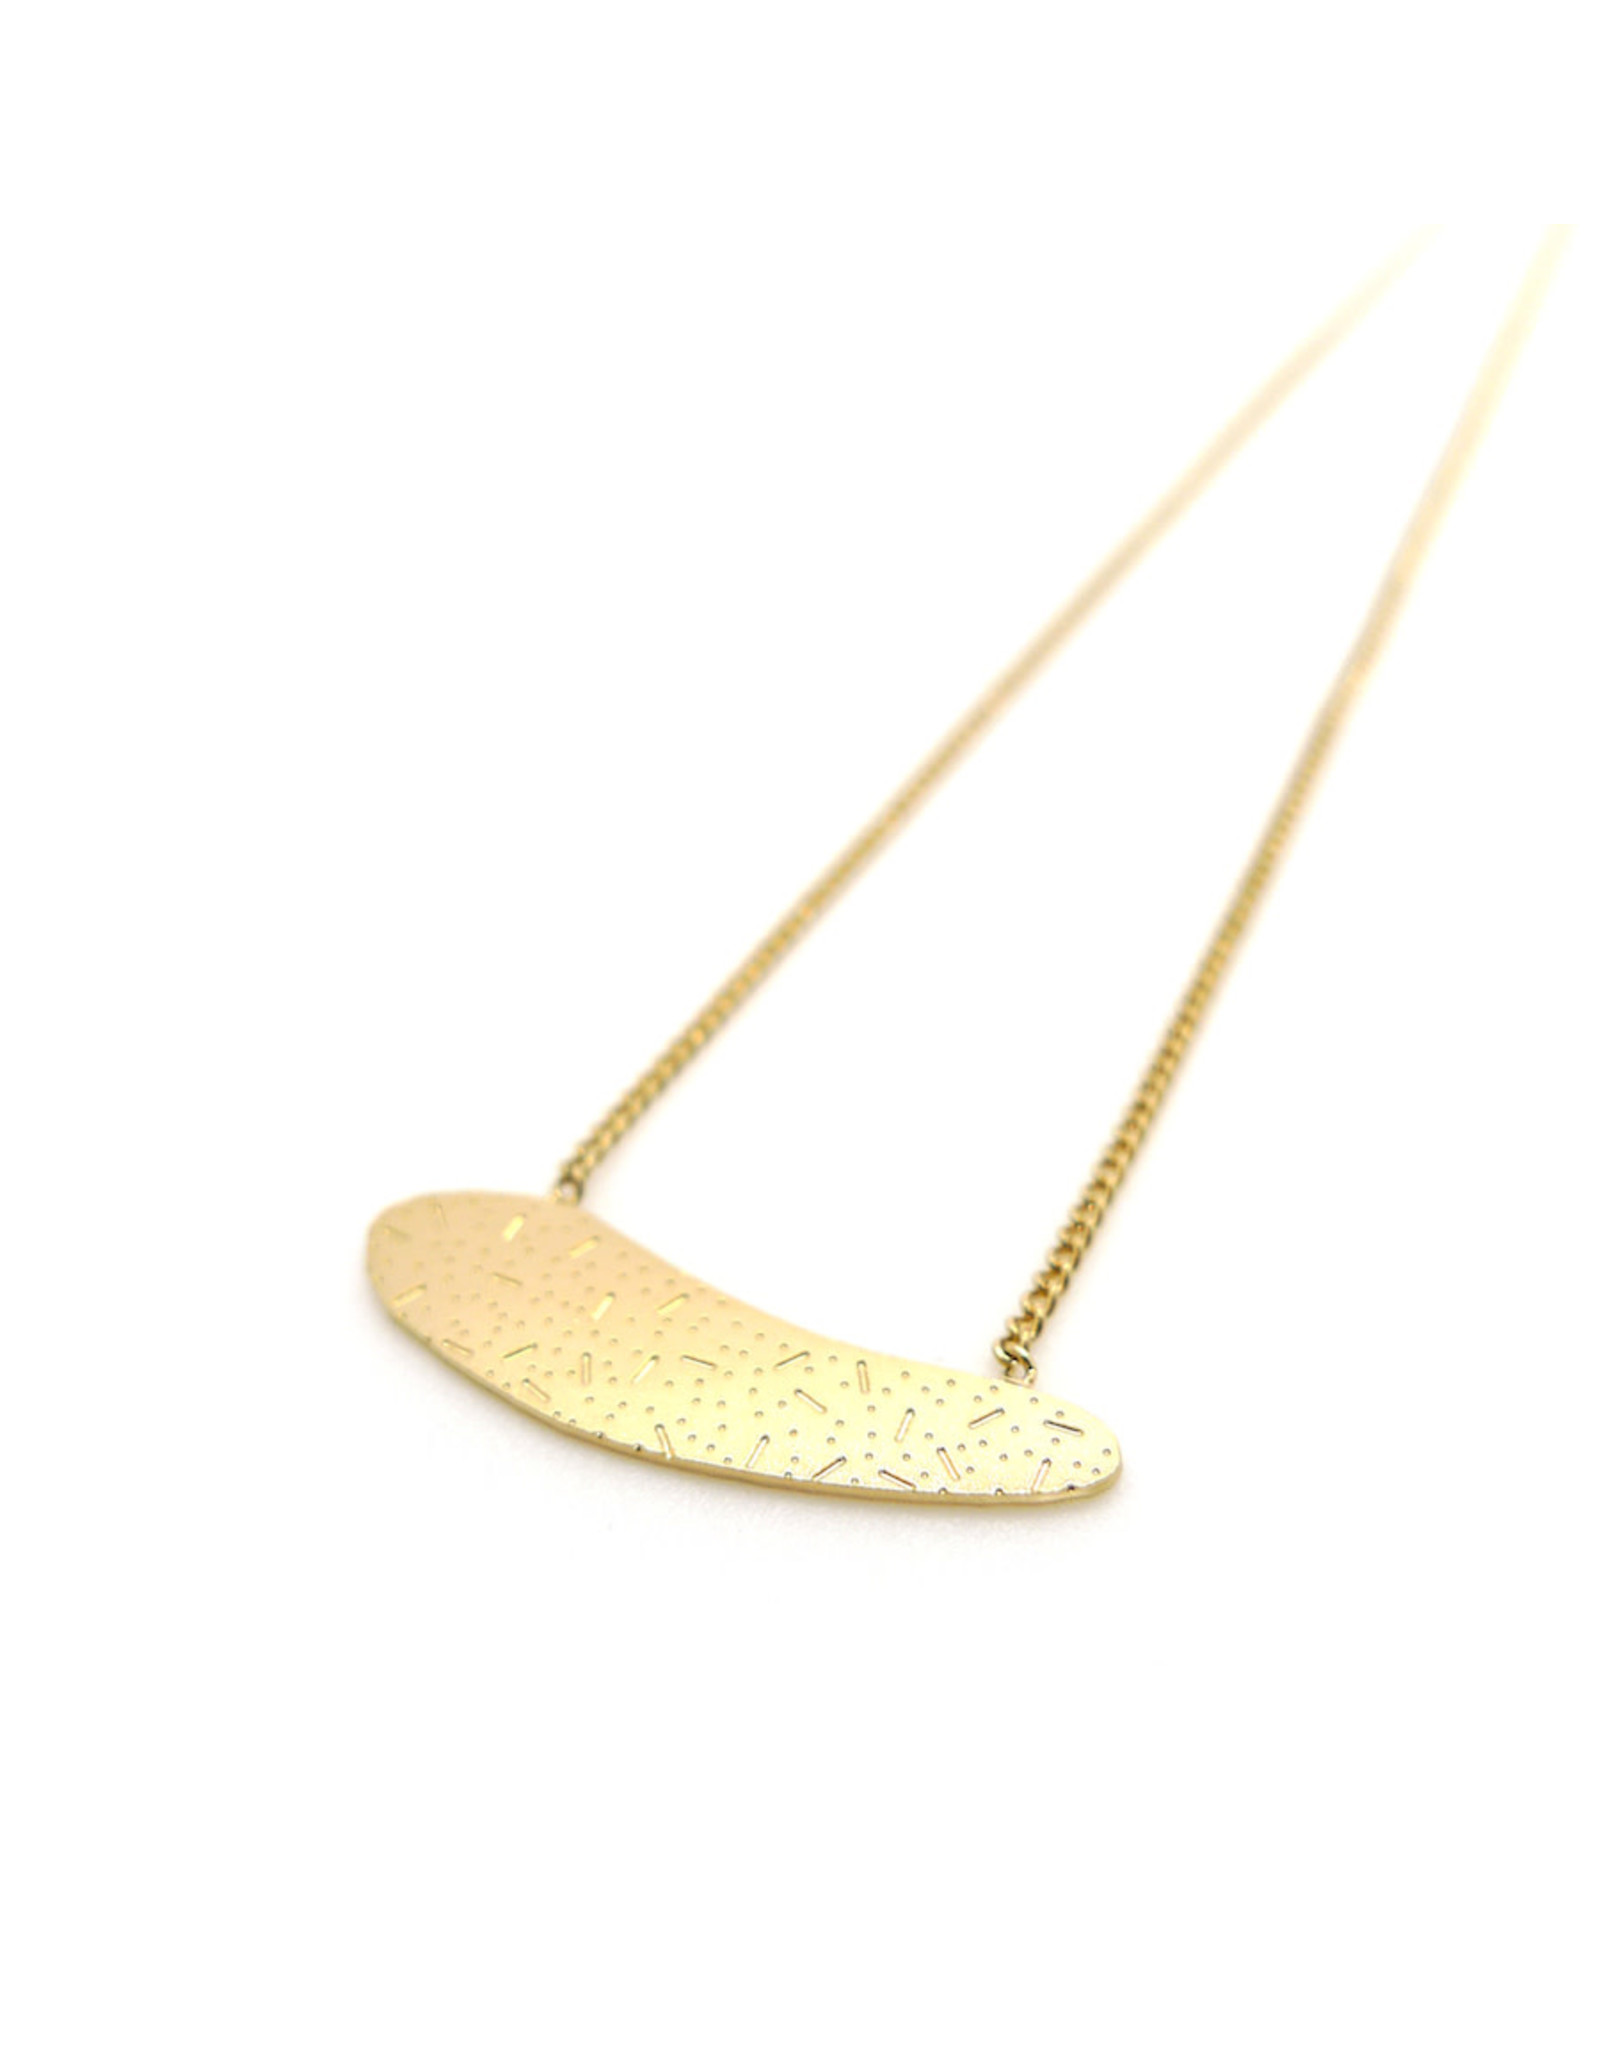 Nadja Carlotti Necklace Sediment, gold plated